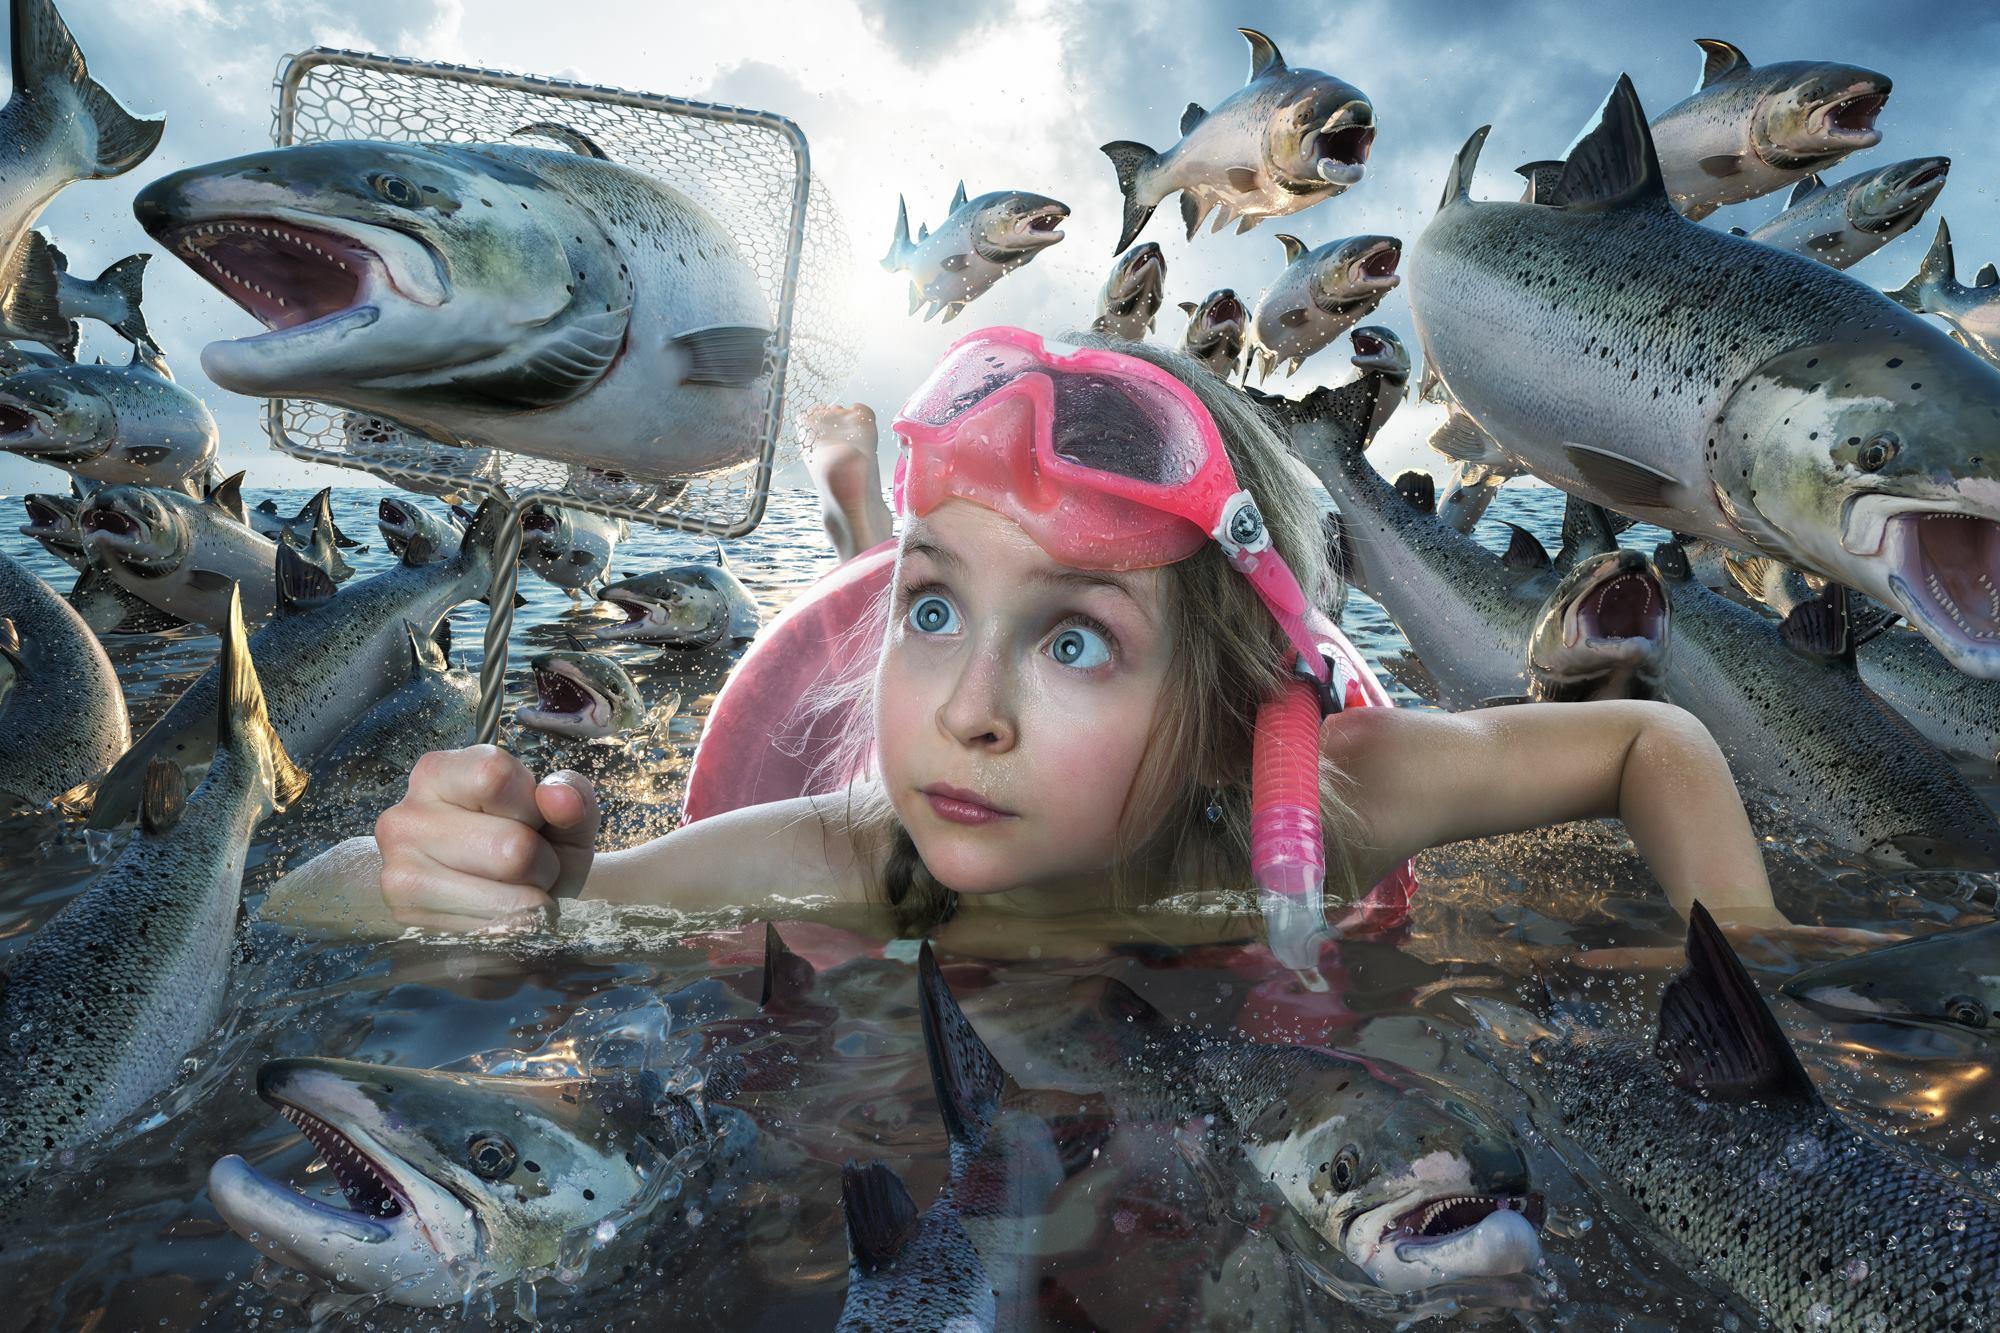 image.num1532714196.of.world-lolo.com.jpg